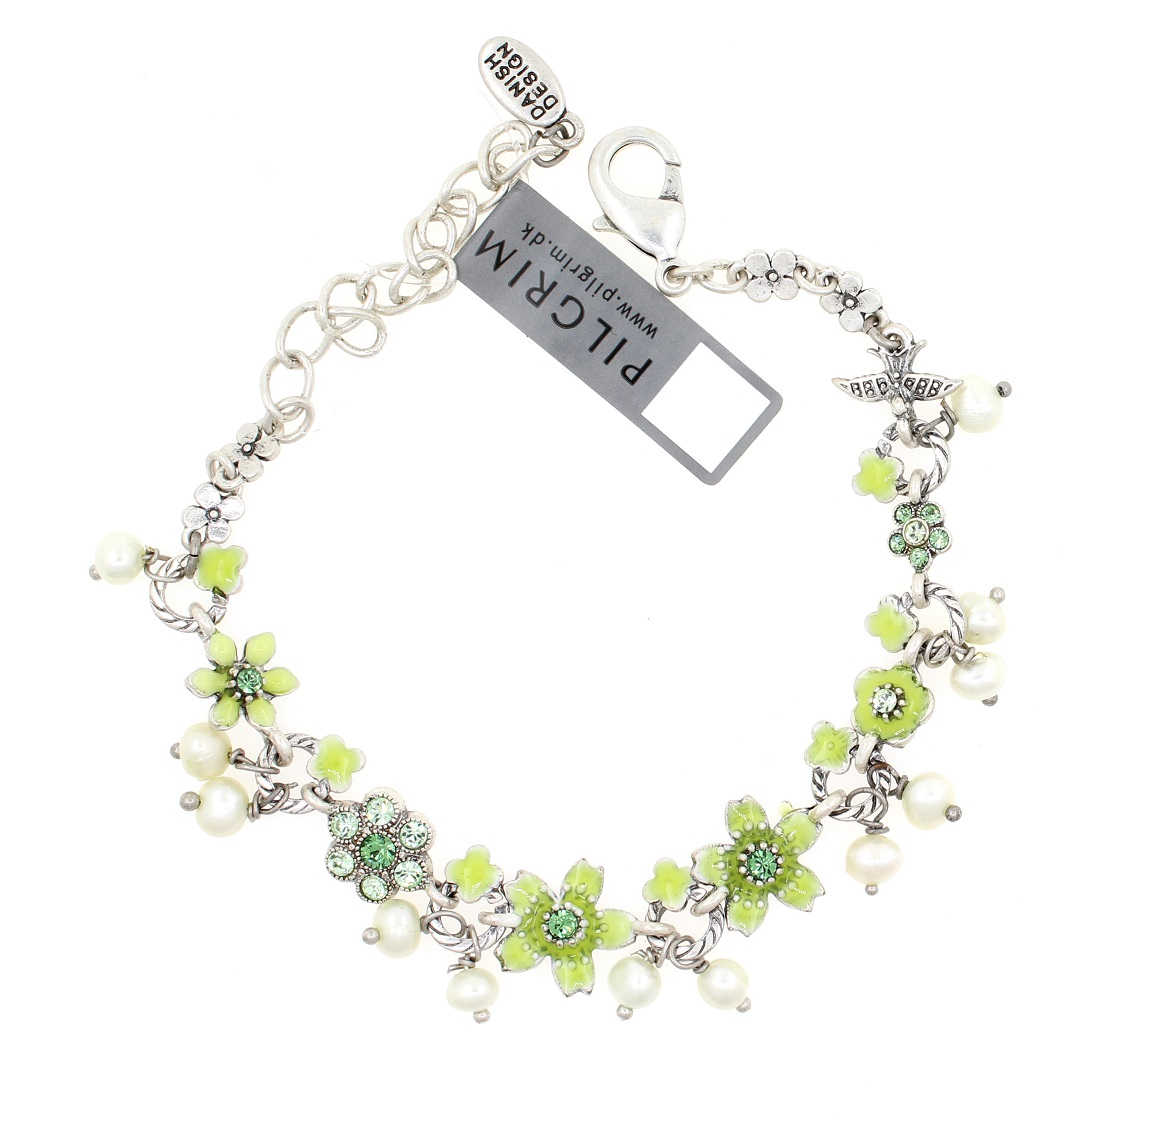 PILGRIM - Swallows & Flowers - Bracelet Oxidised Silver/Green BNWT